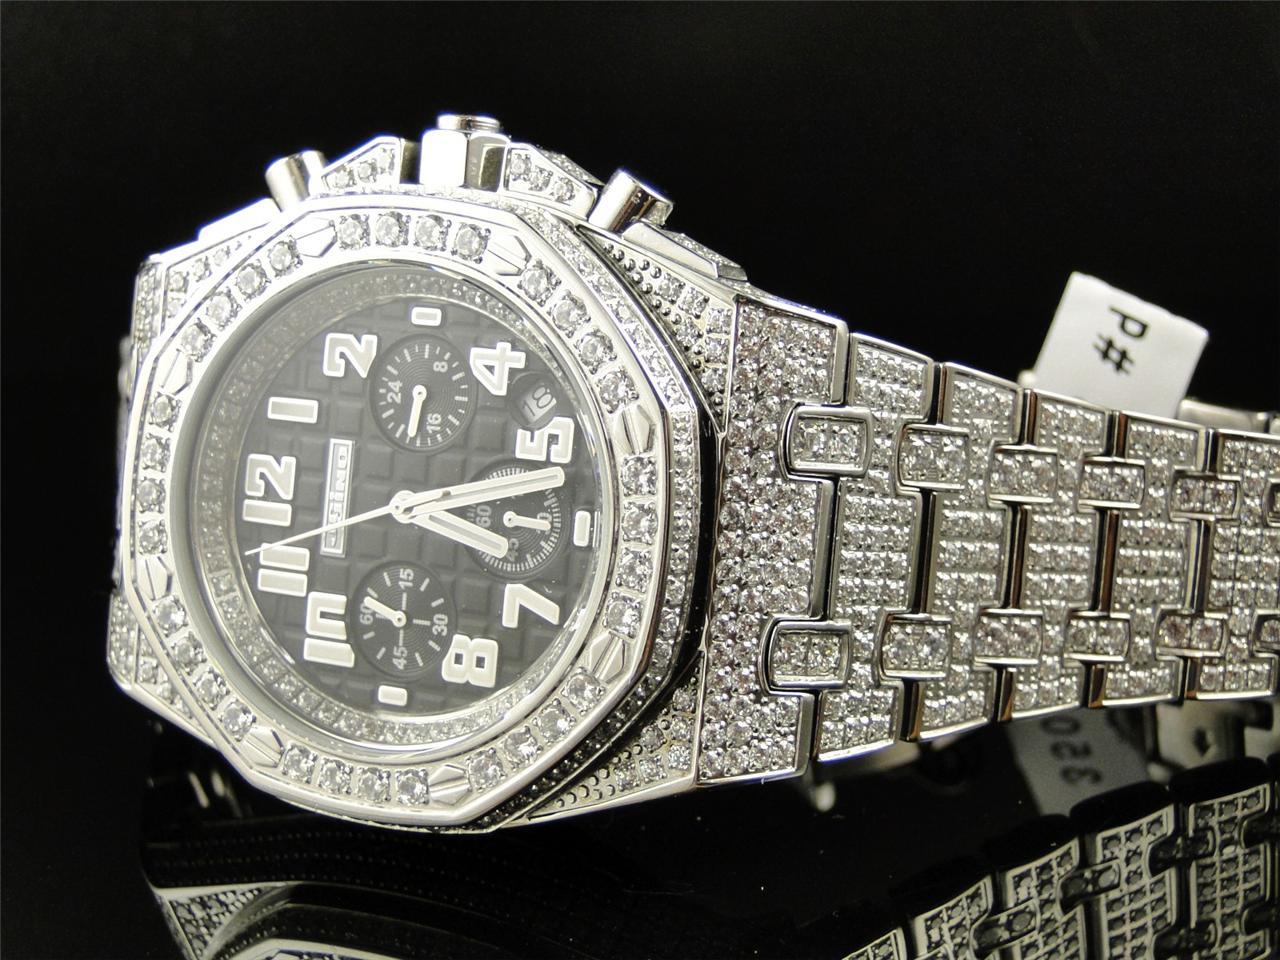 Sản Phẩm Mens Jojino By Joe Rodeo Simulated Diamond Watch Black Mj